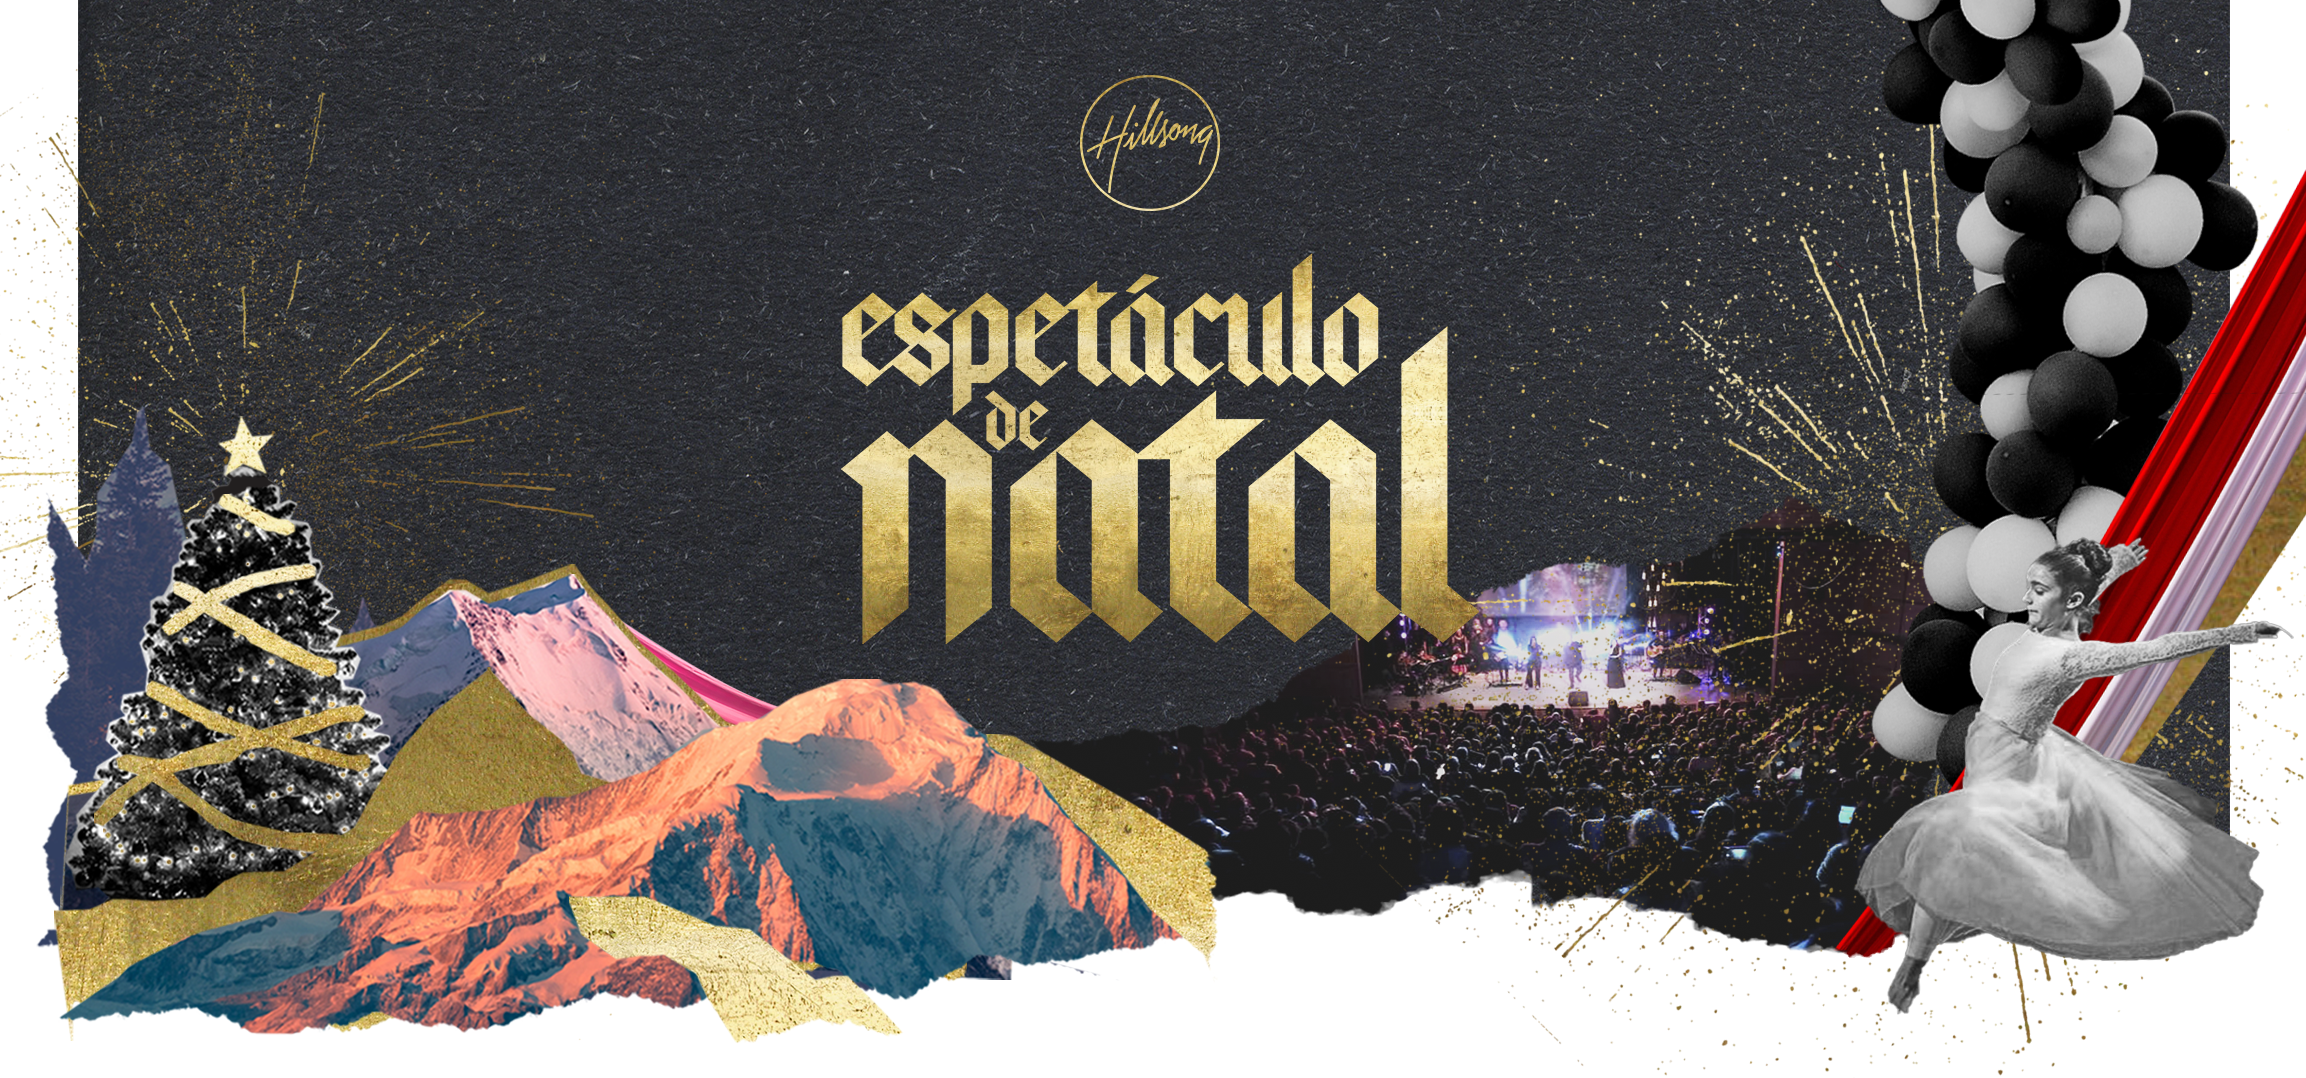 Hillsong Portugal - Espetáculo de Natal